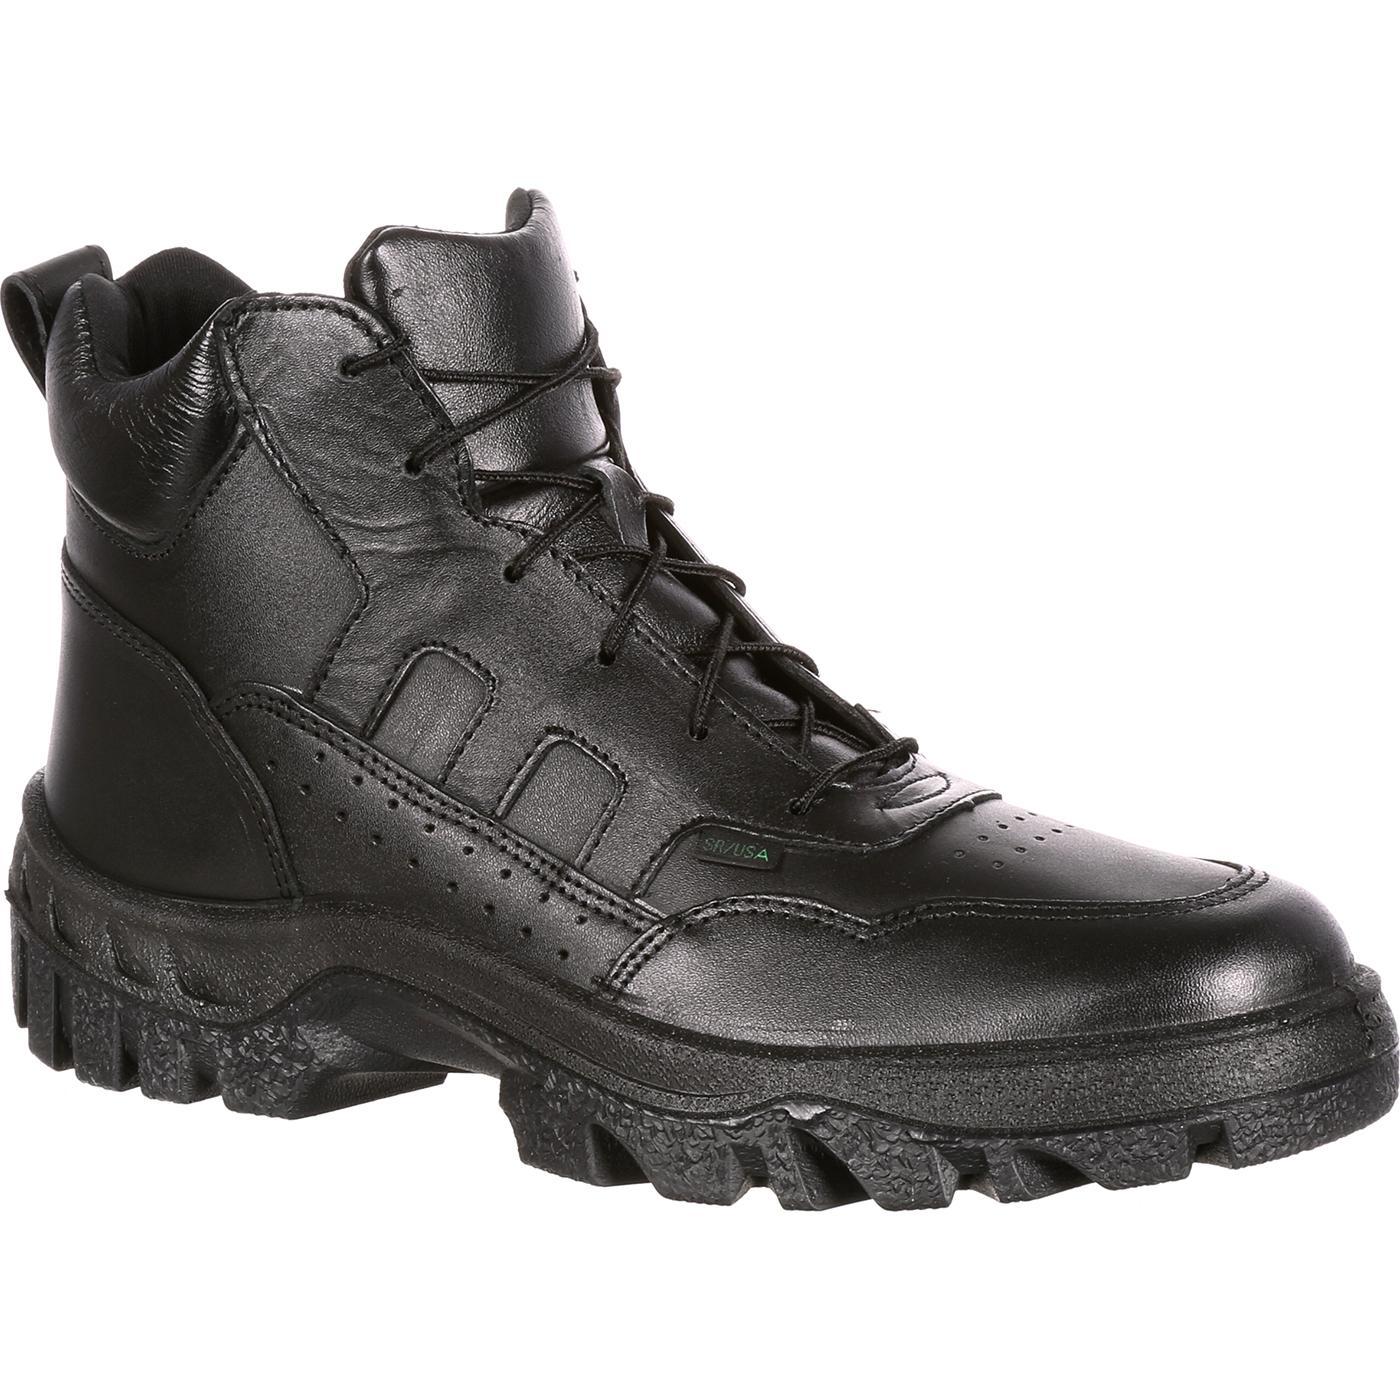 Black Rocky Mens Leather Boots Postal Tmc Plain Toe Hiker